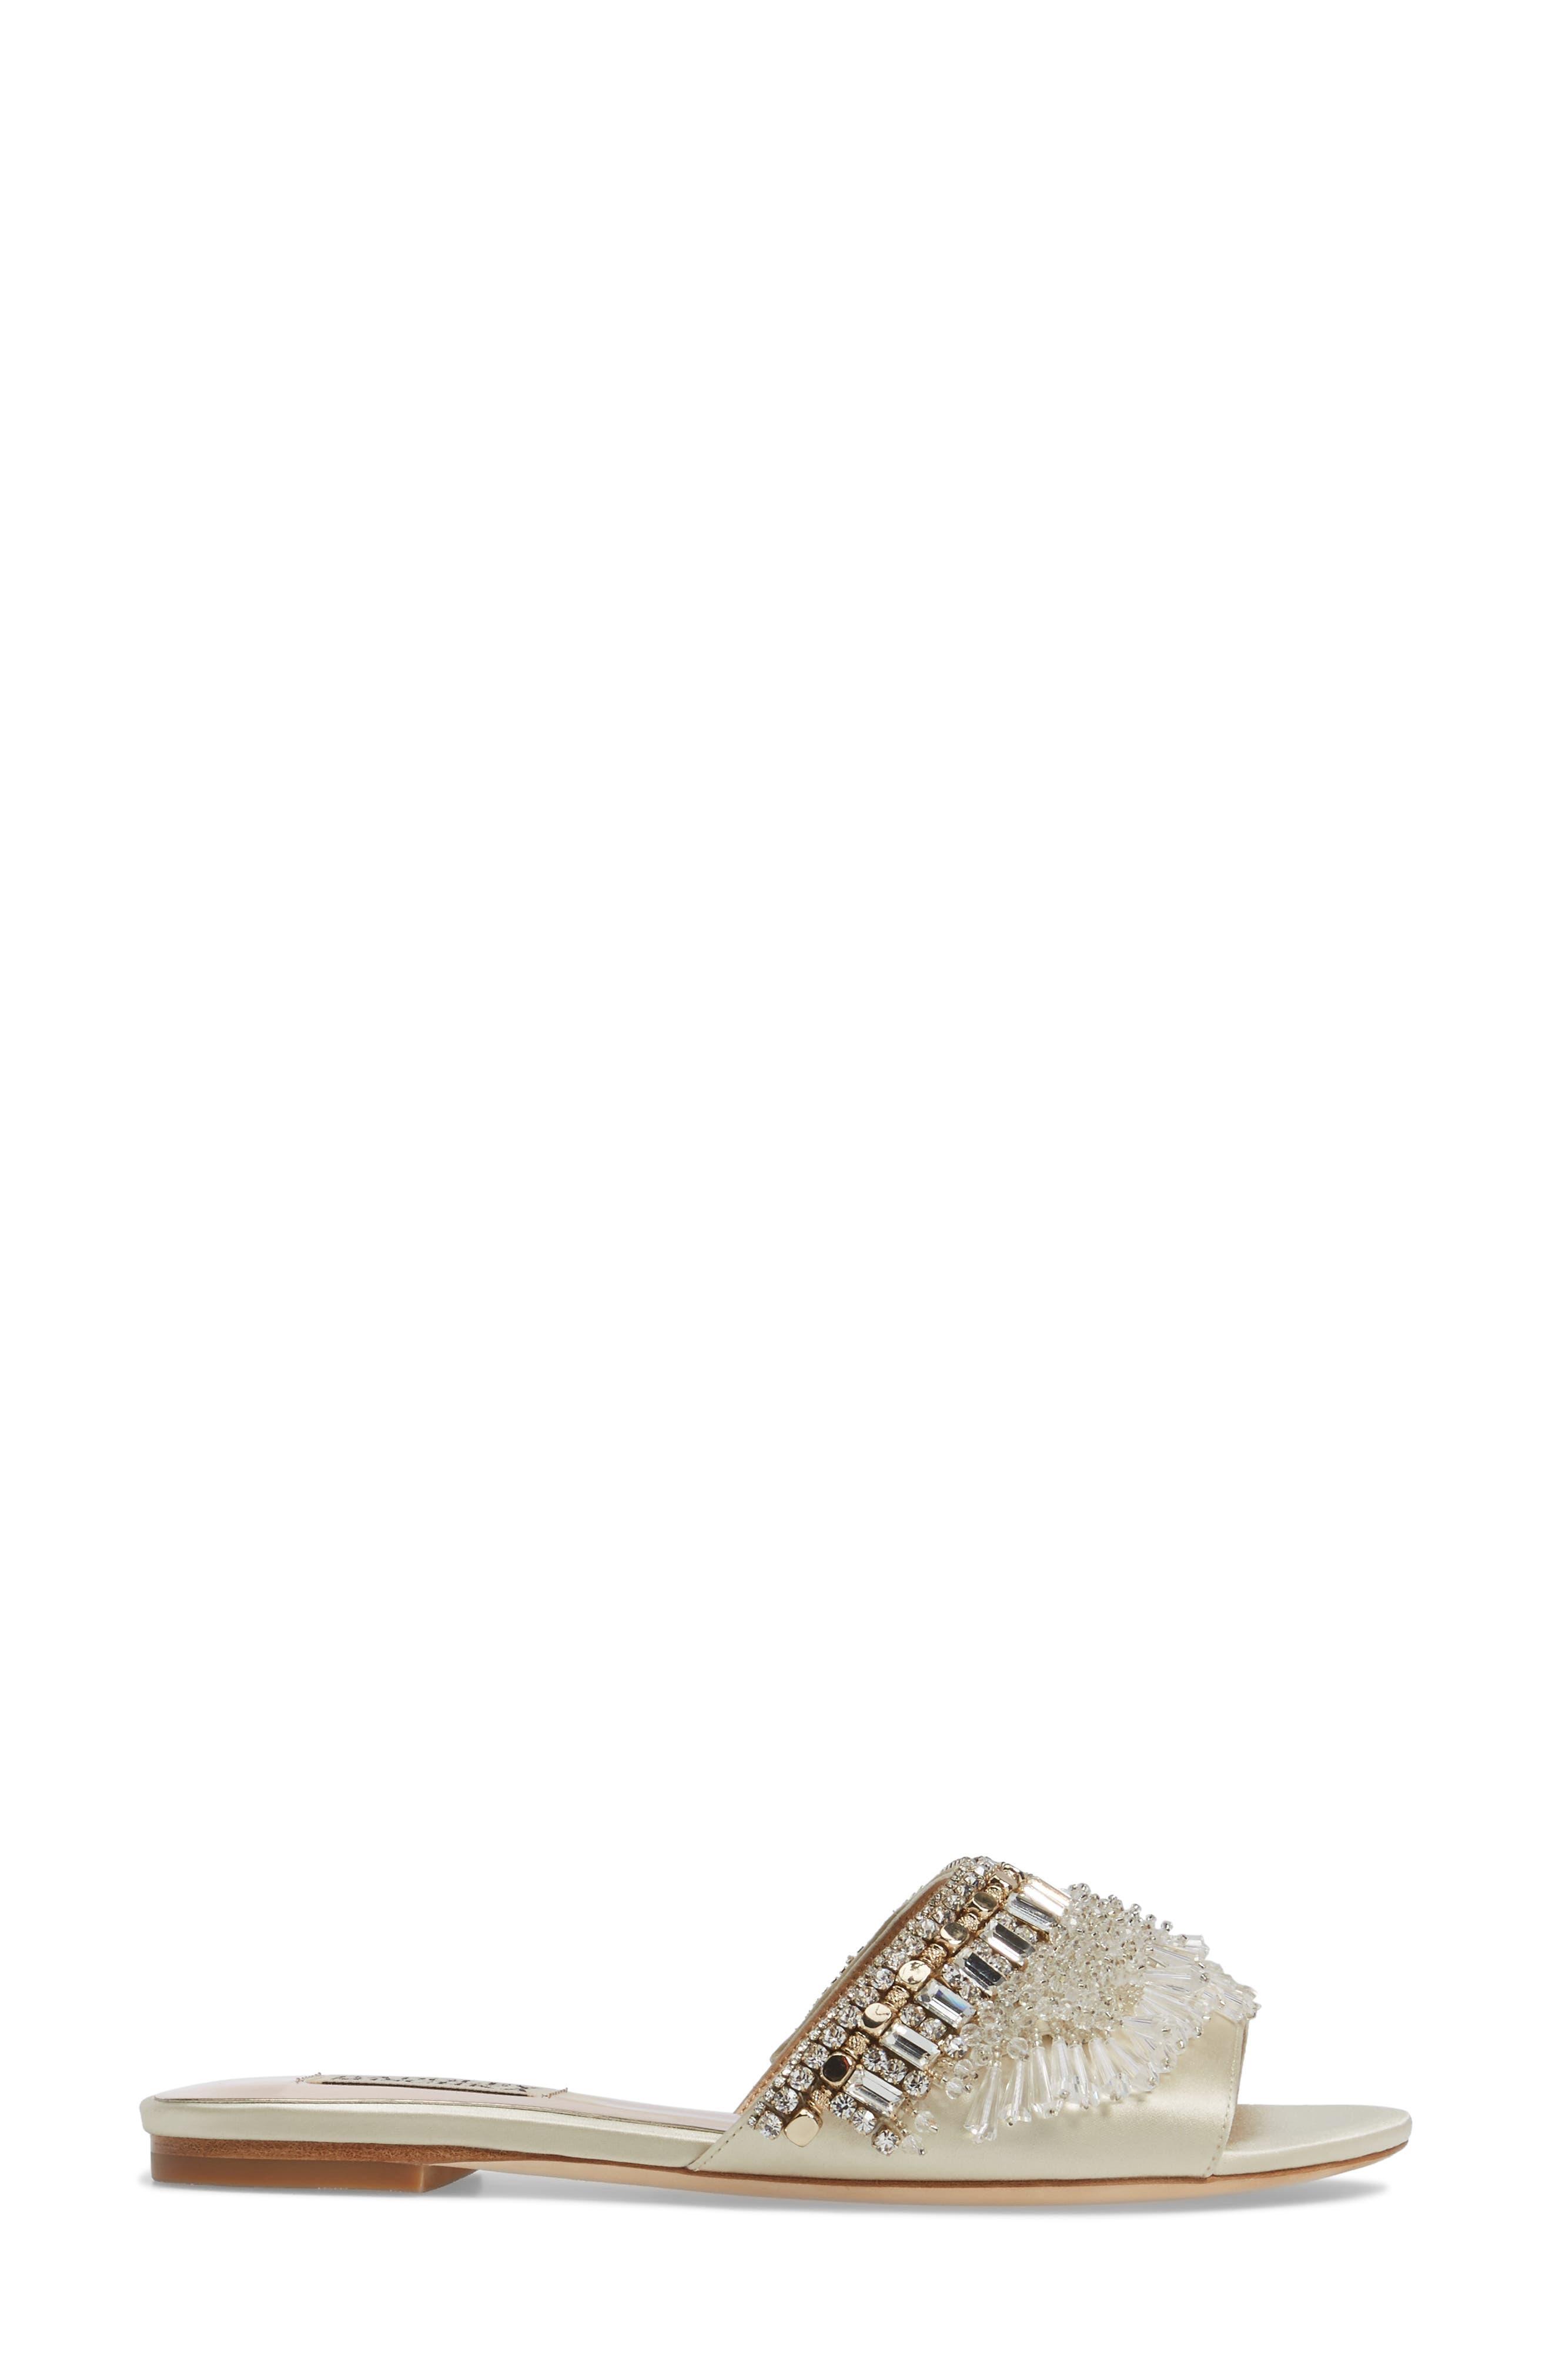 Alternate Image 3  - Badgley Mischka Kassandra Embellished Slide Sandal (Women)